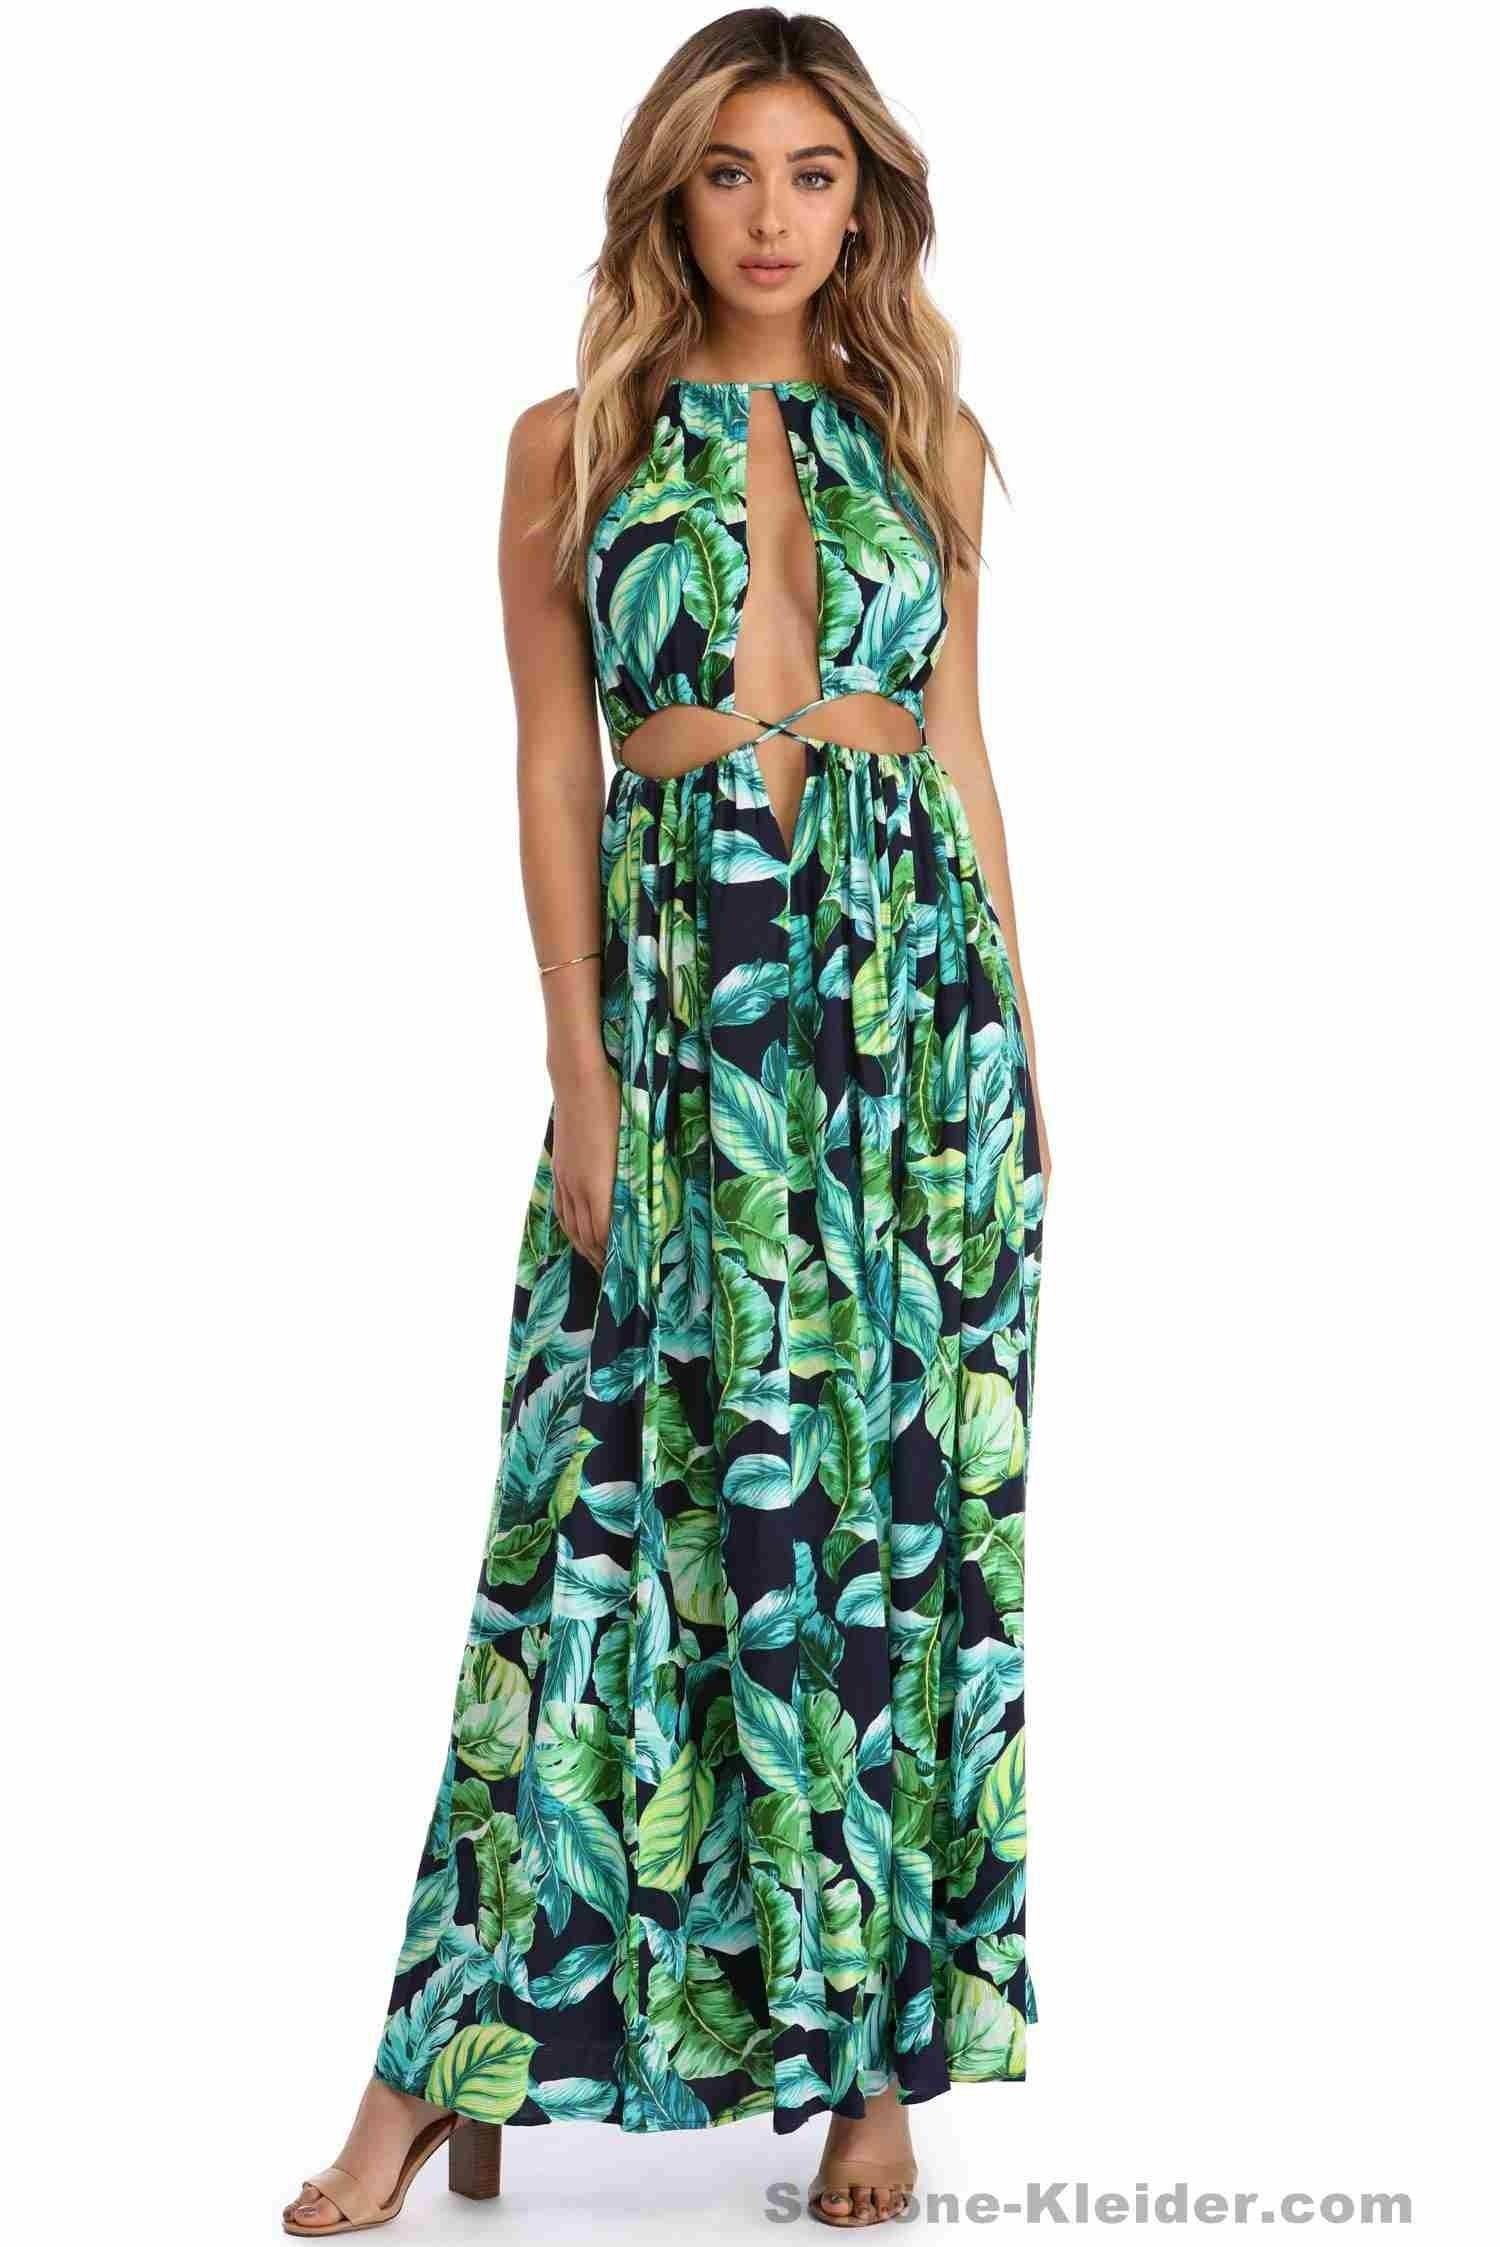 Leicht Sommerkleider Lang Elegant Ärmel10 Perfekt Sommerkleider Lang Elegant Spezialgebiet